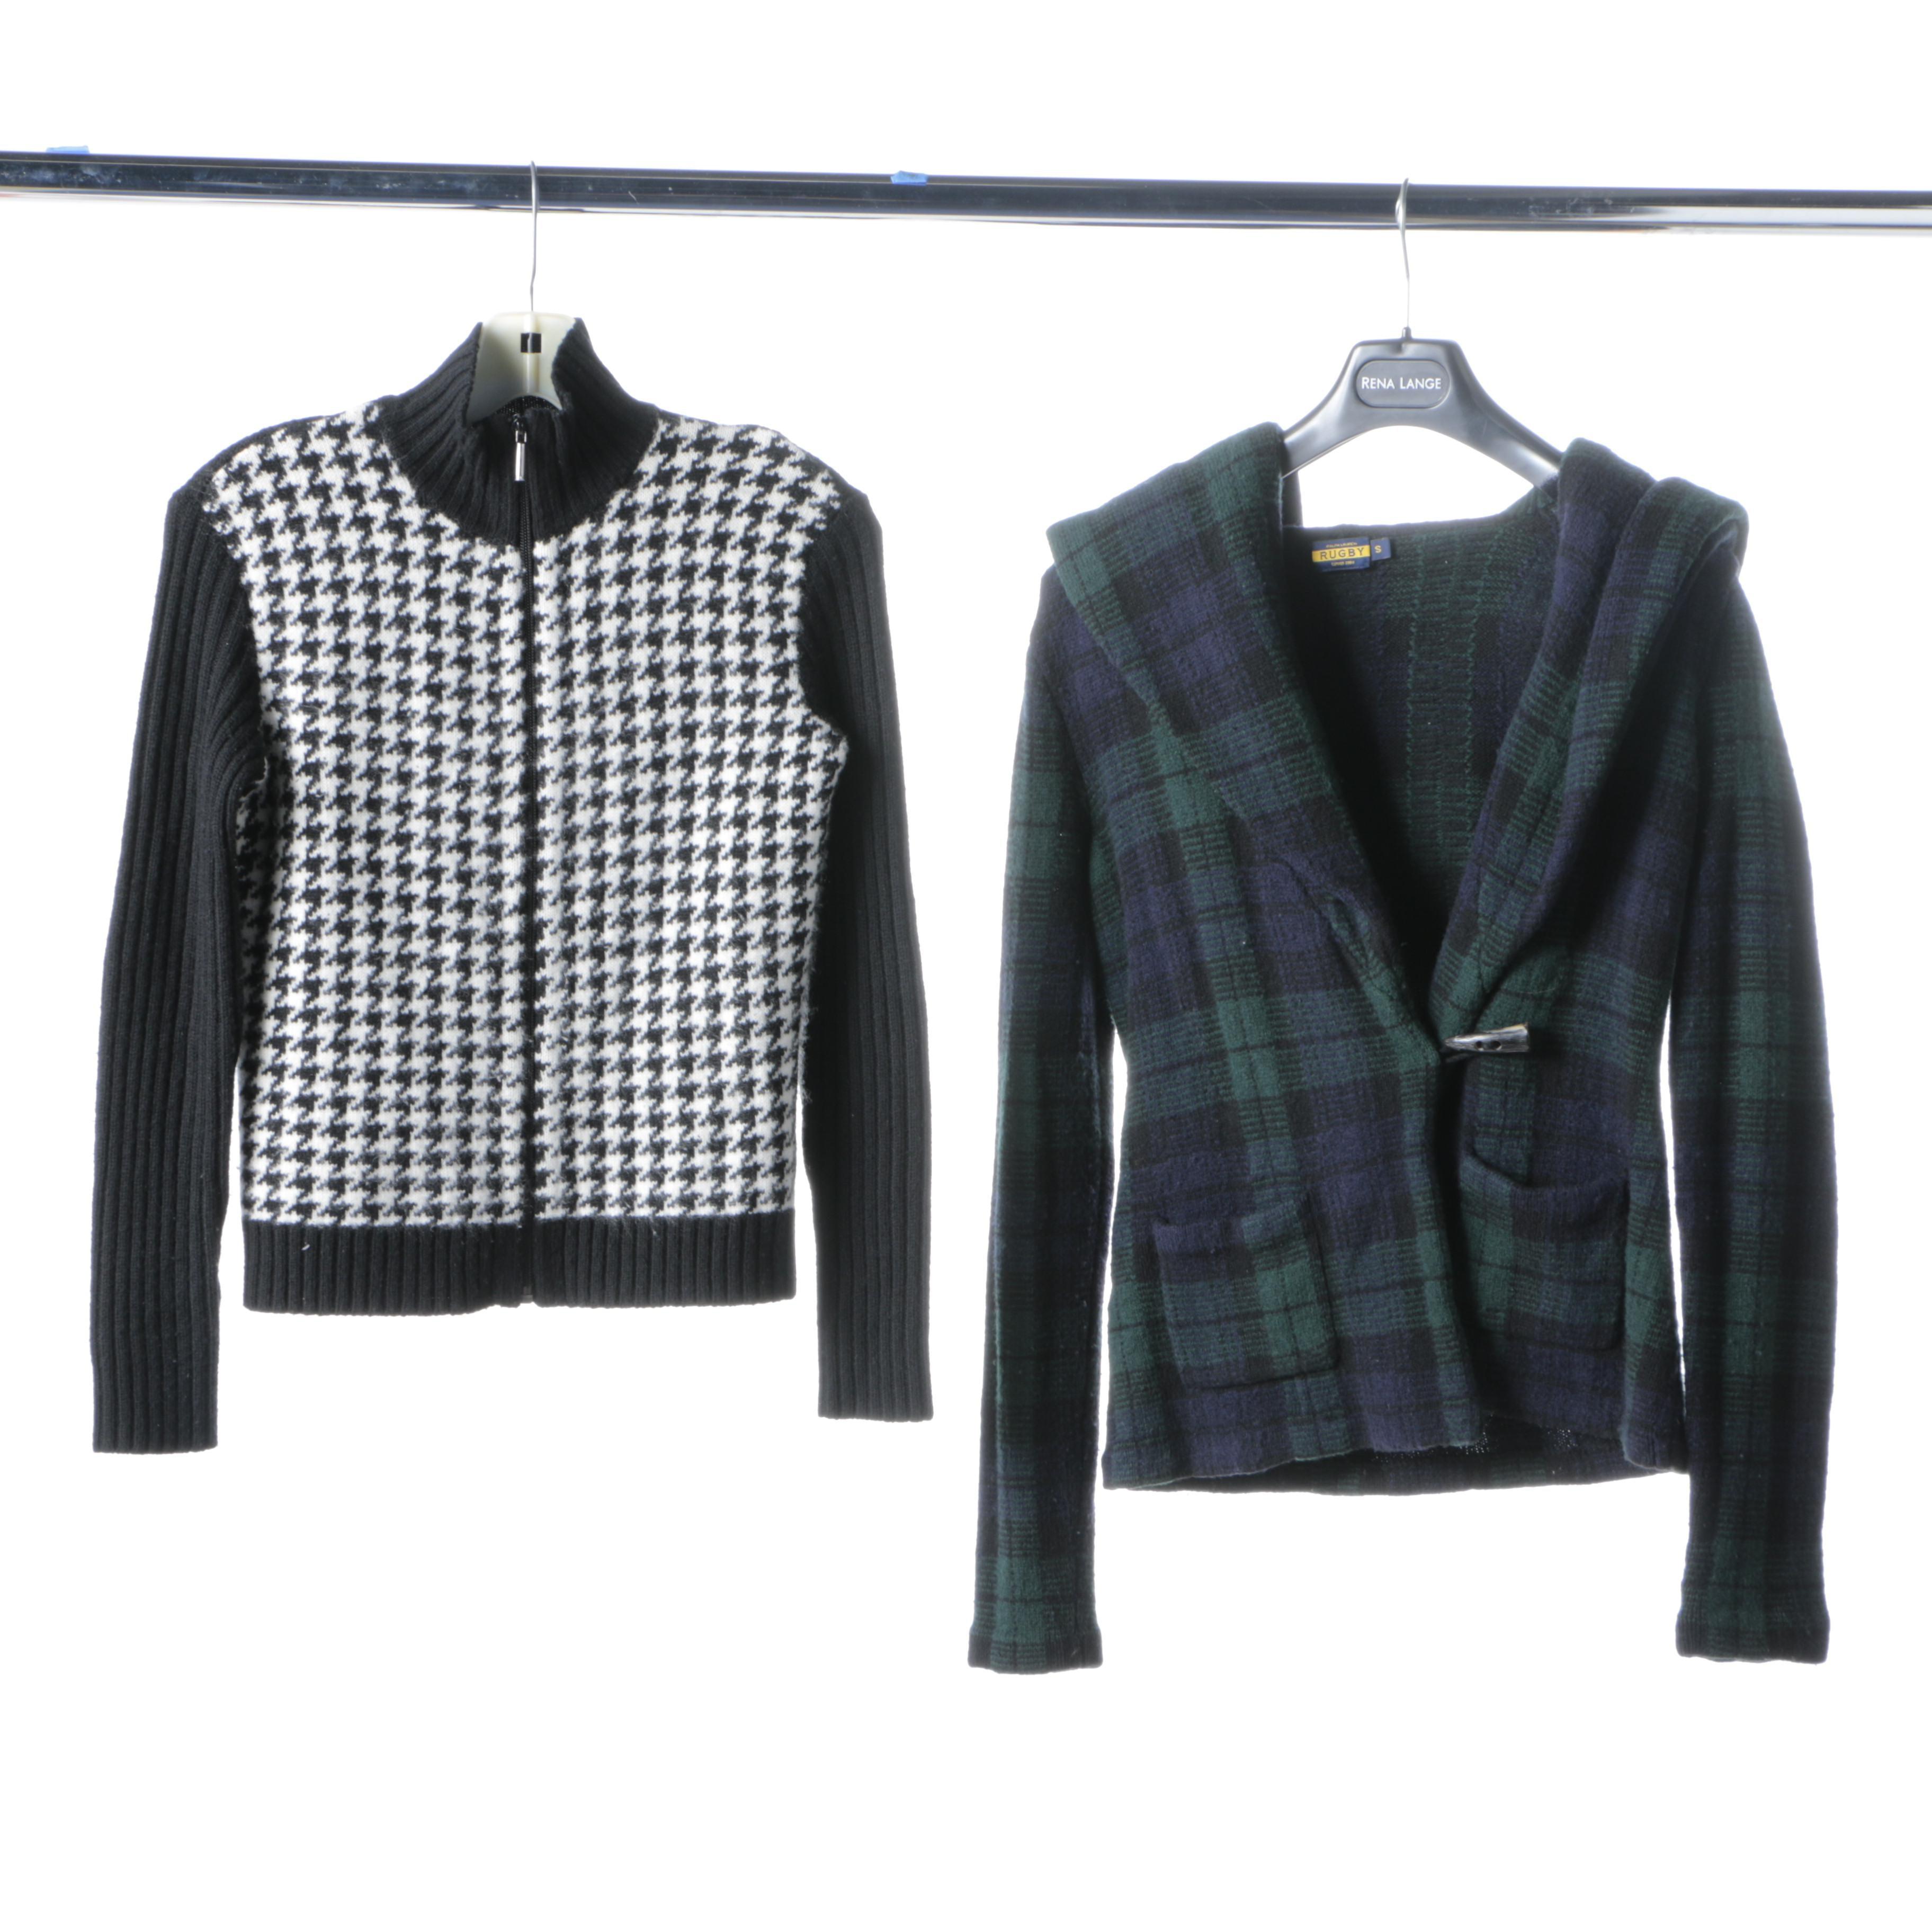 Pair of Ralph Lauren Sweater Jackets